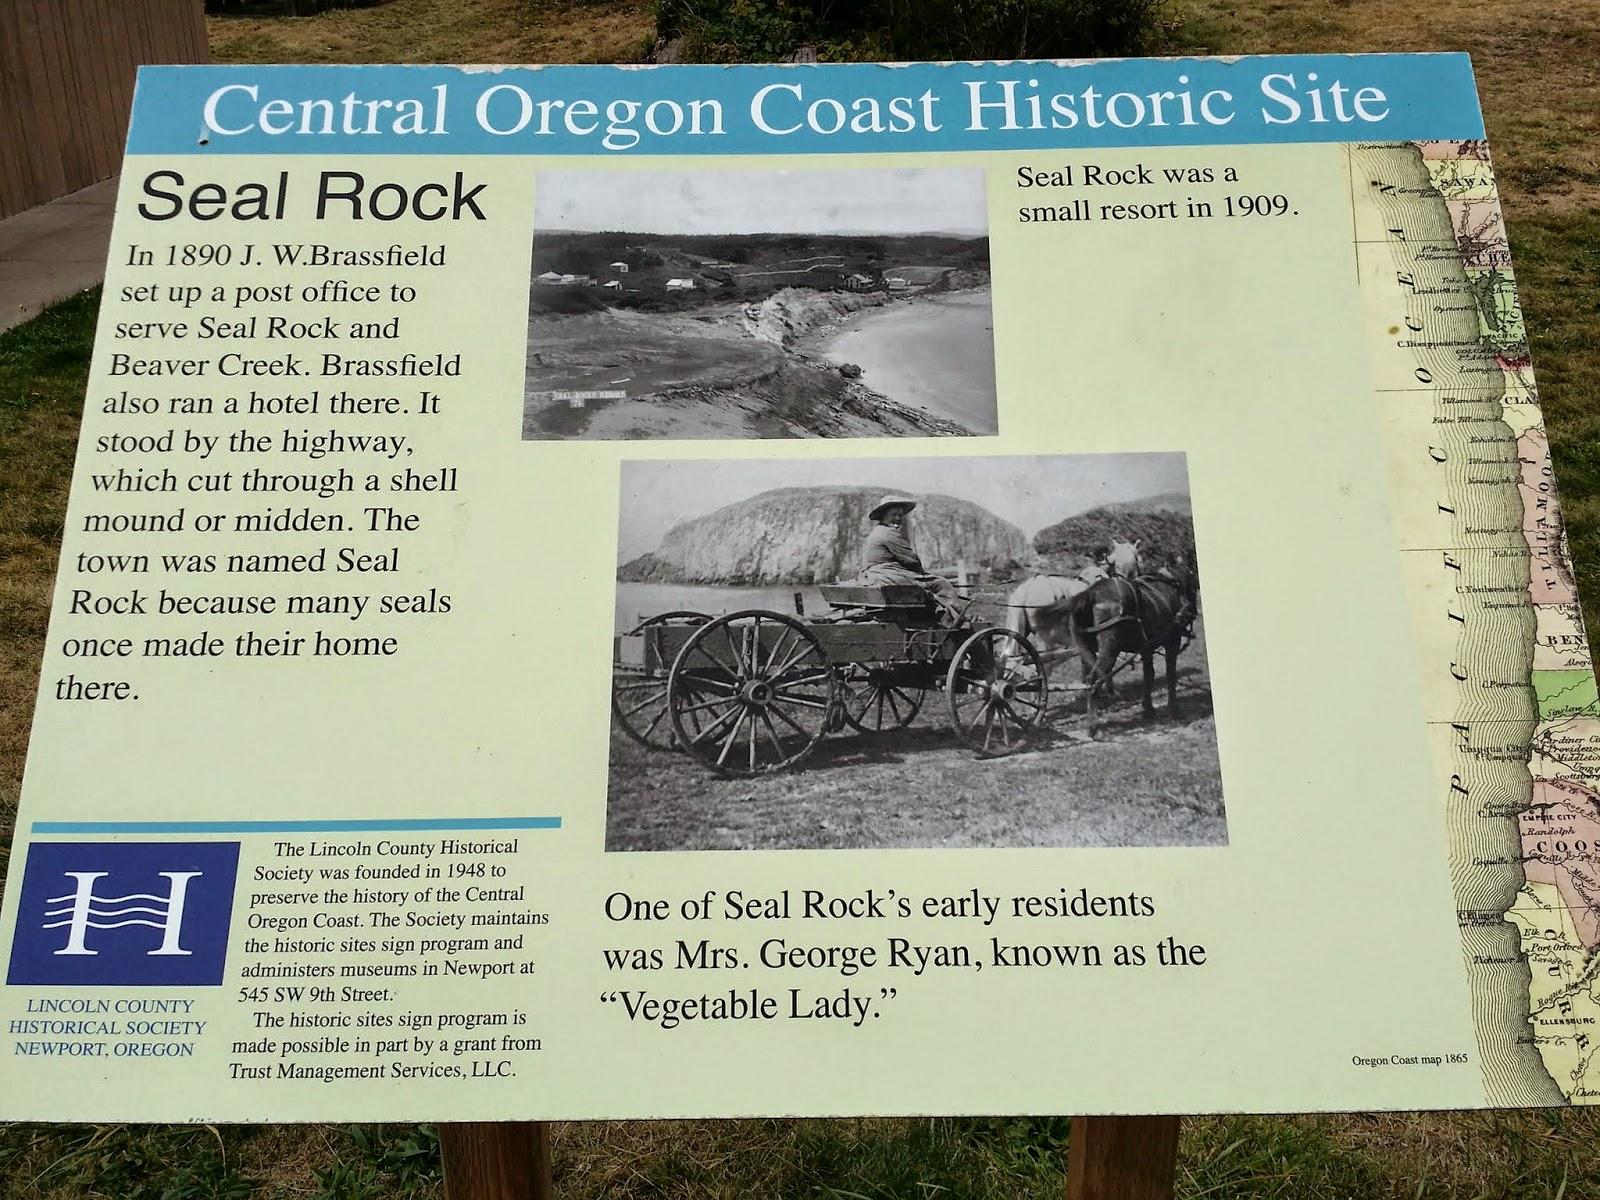 Historic Site info